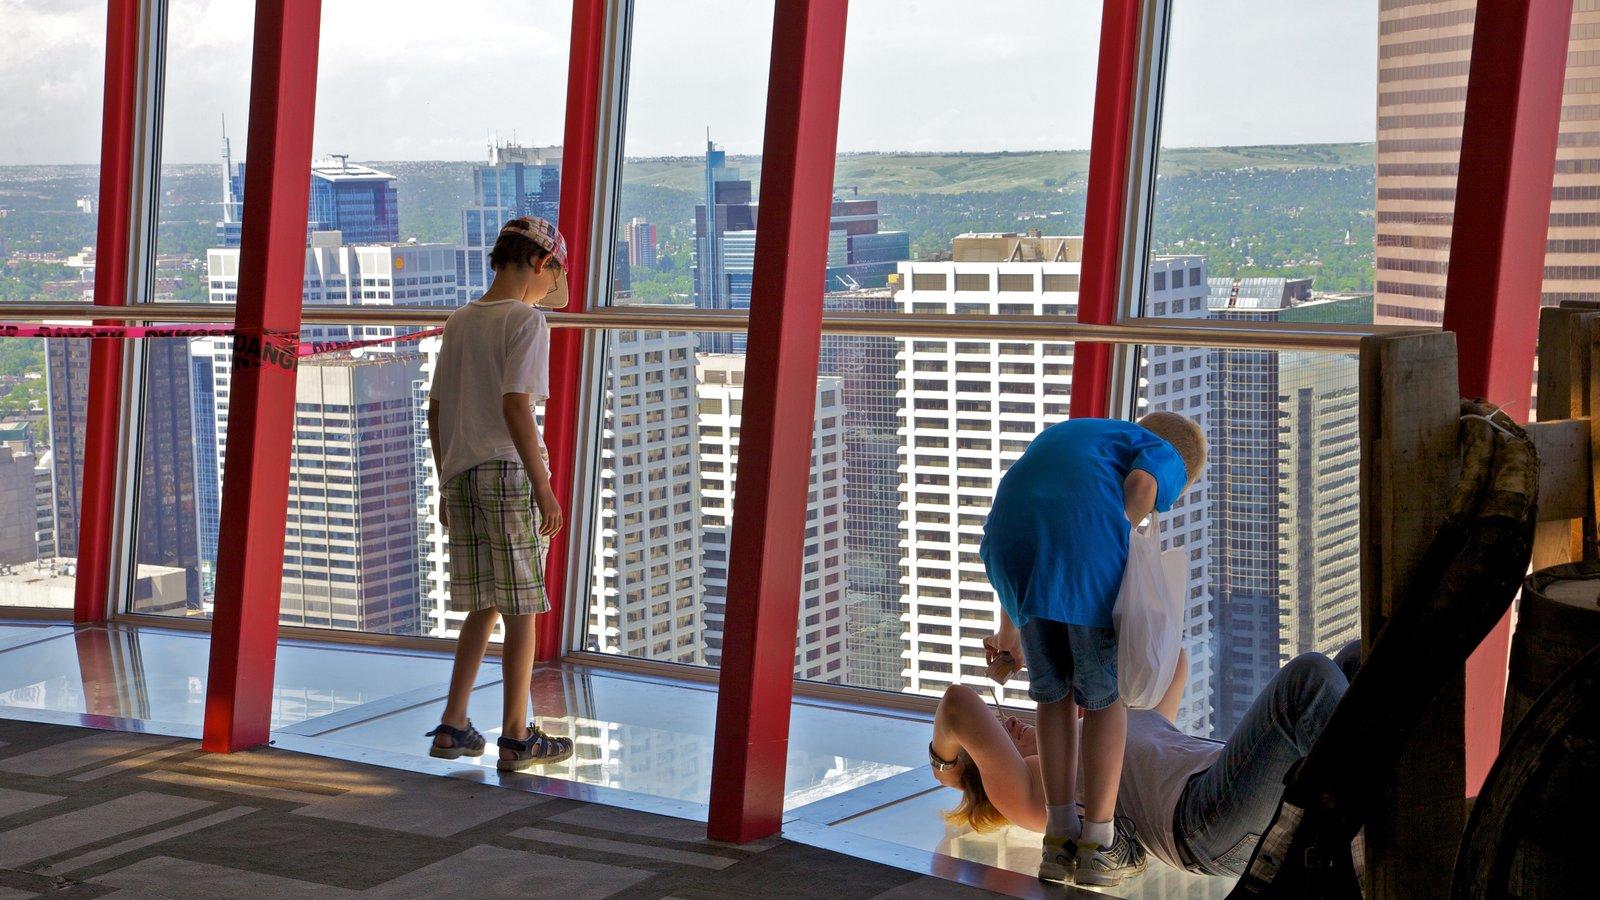 Calgary featuring interior views, a city and views